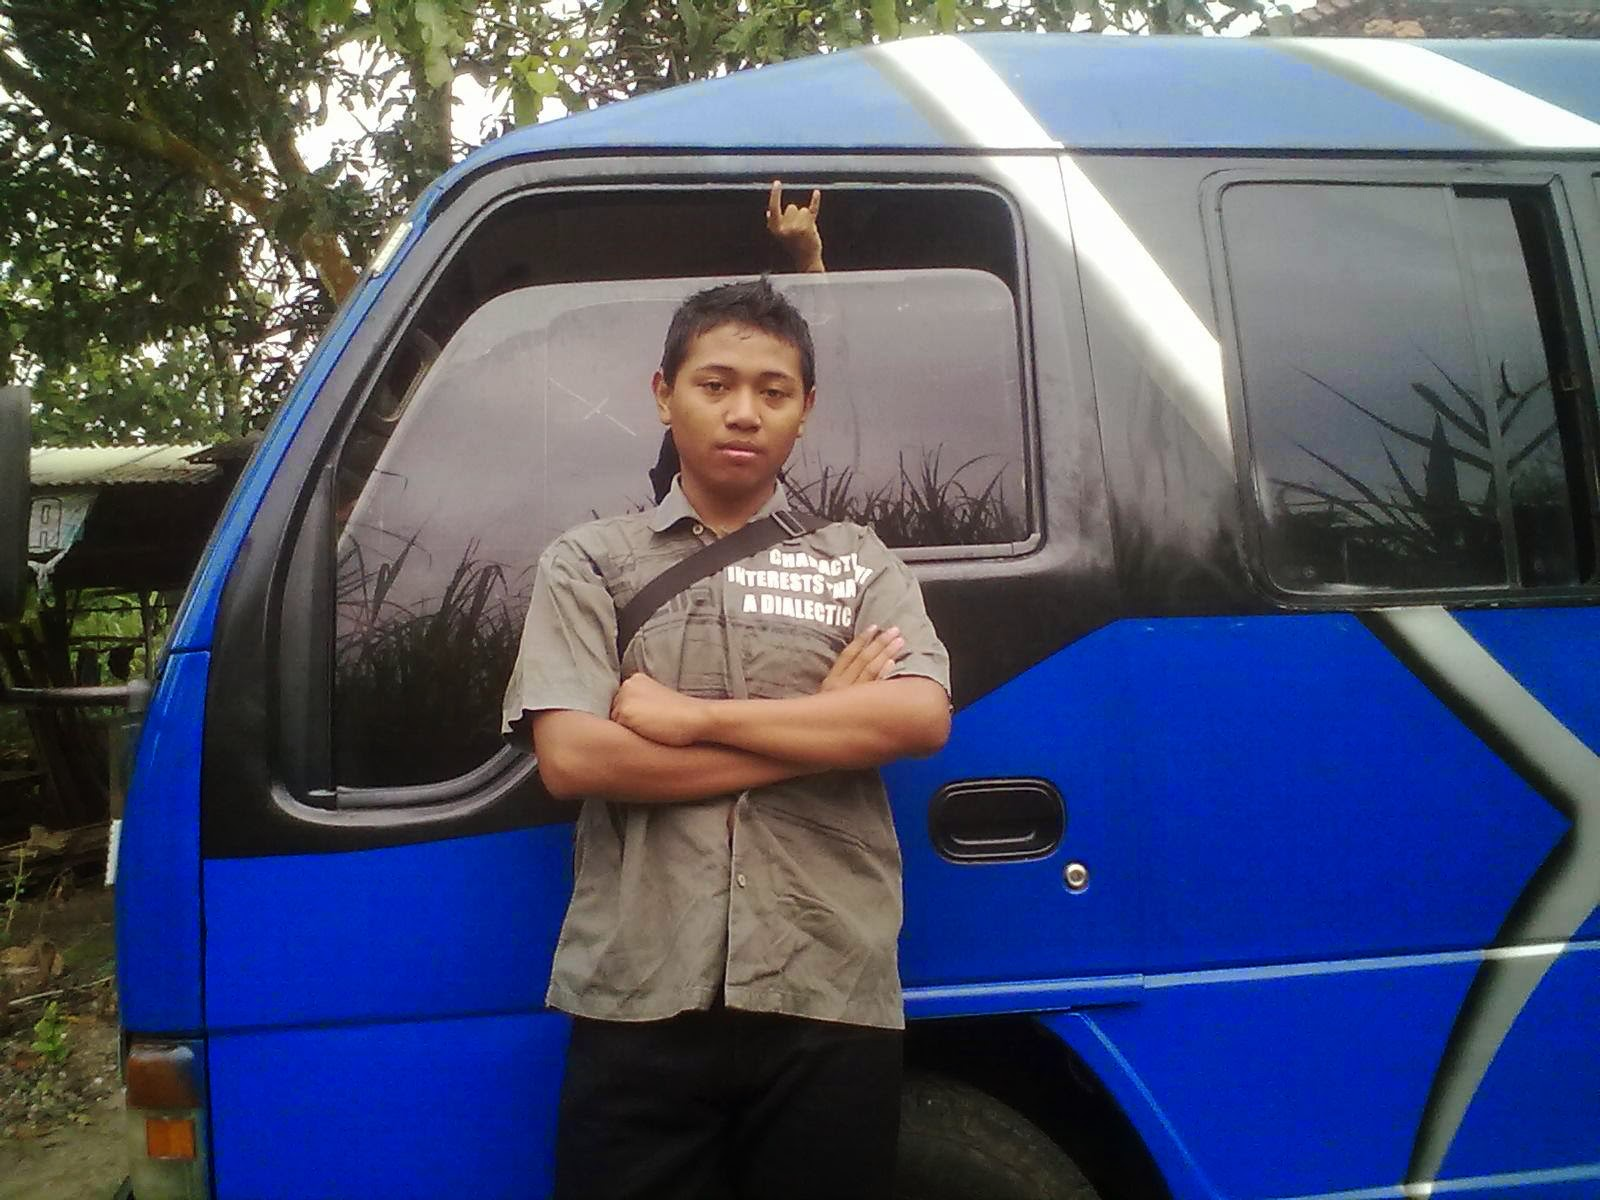 Ali Murtodho, Masih SMA Terobsesi Ingin Memiliki Perusahaan Otobus